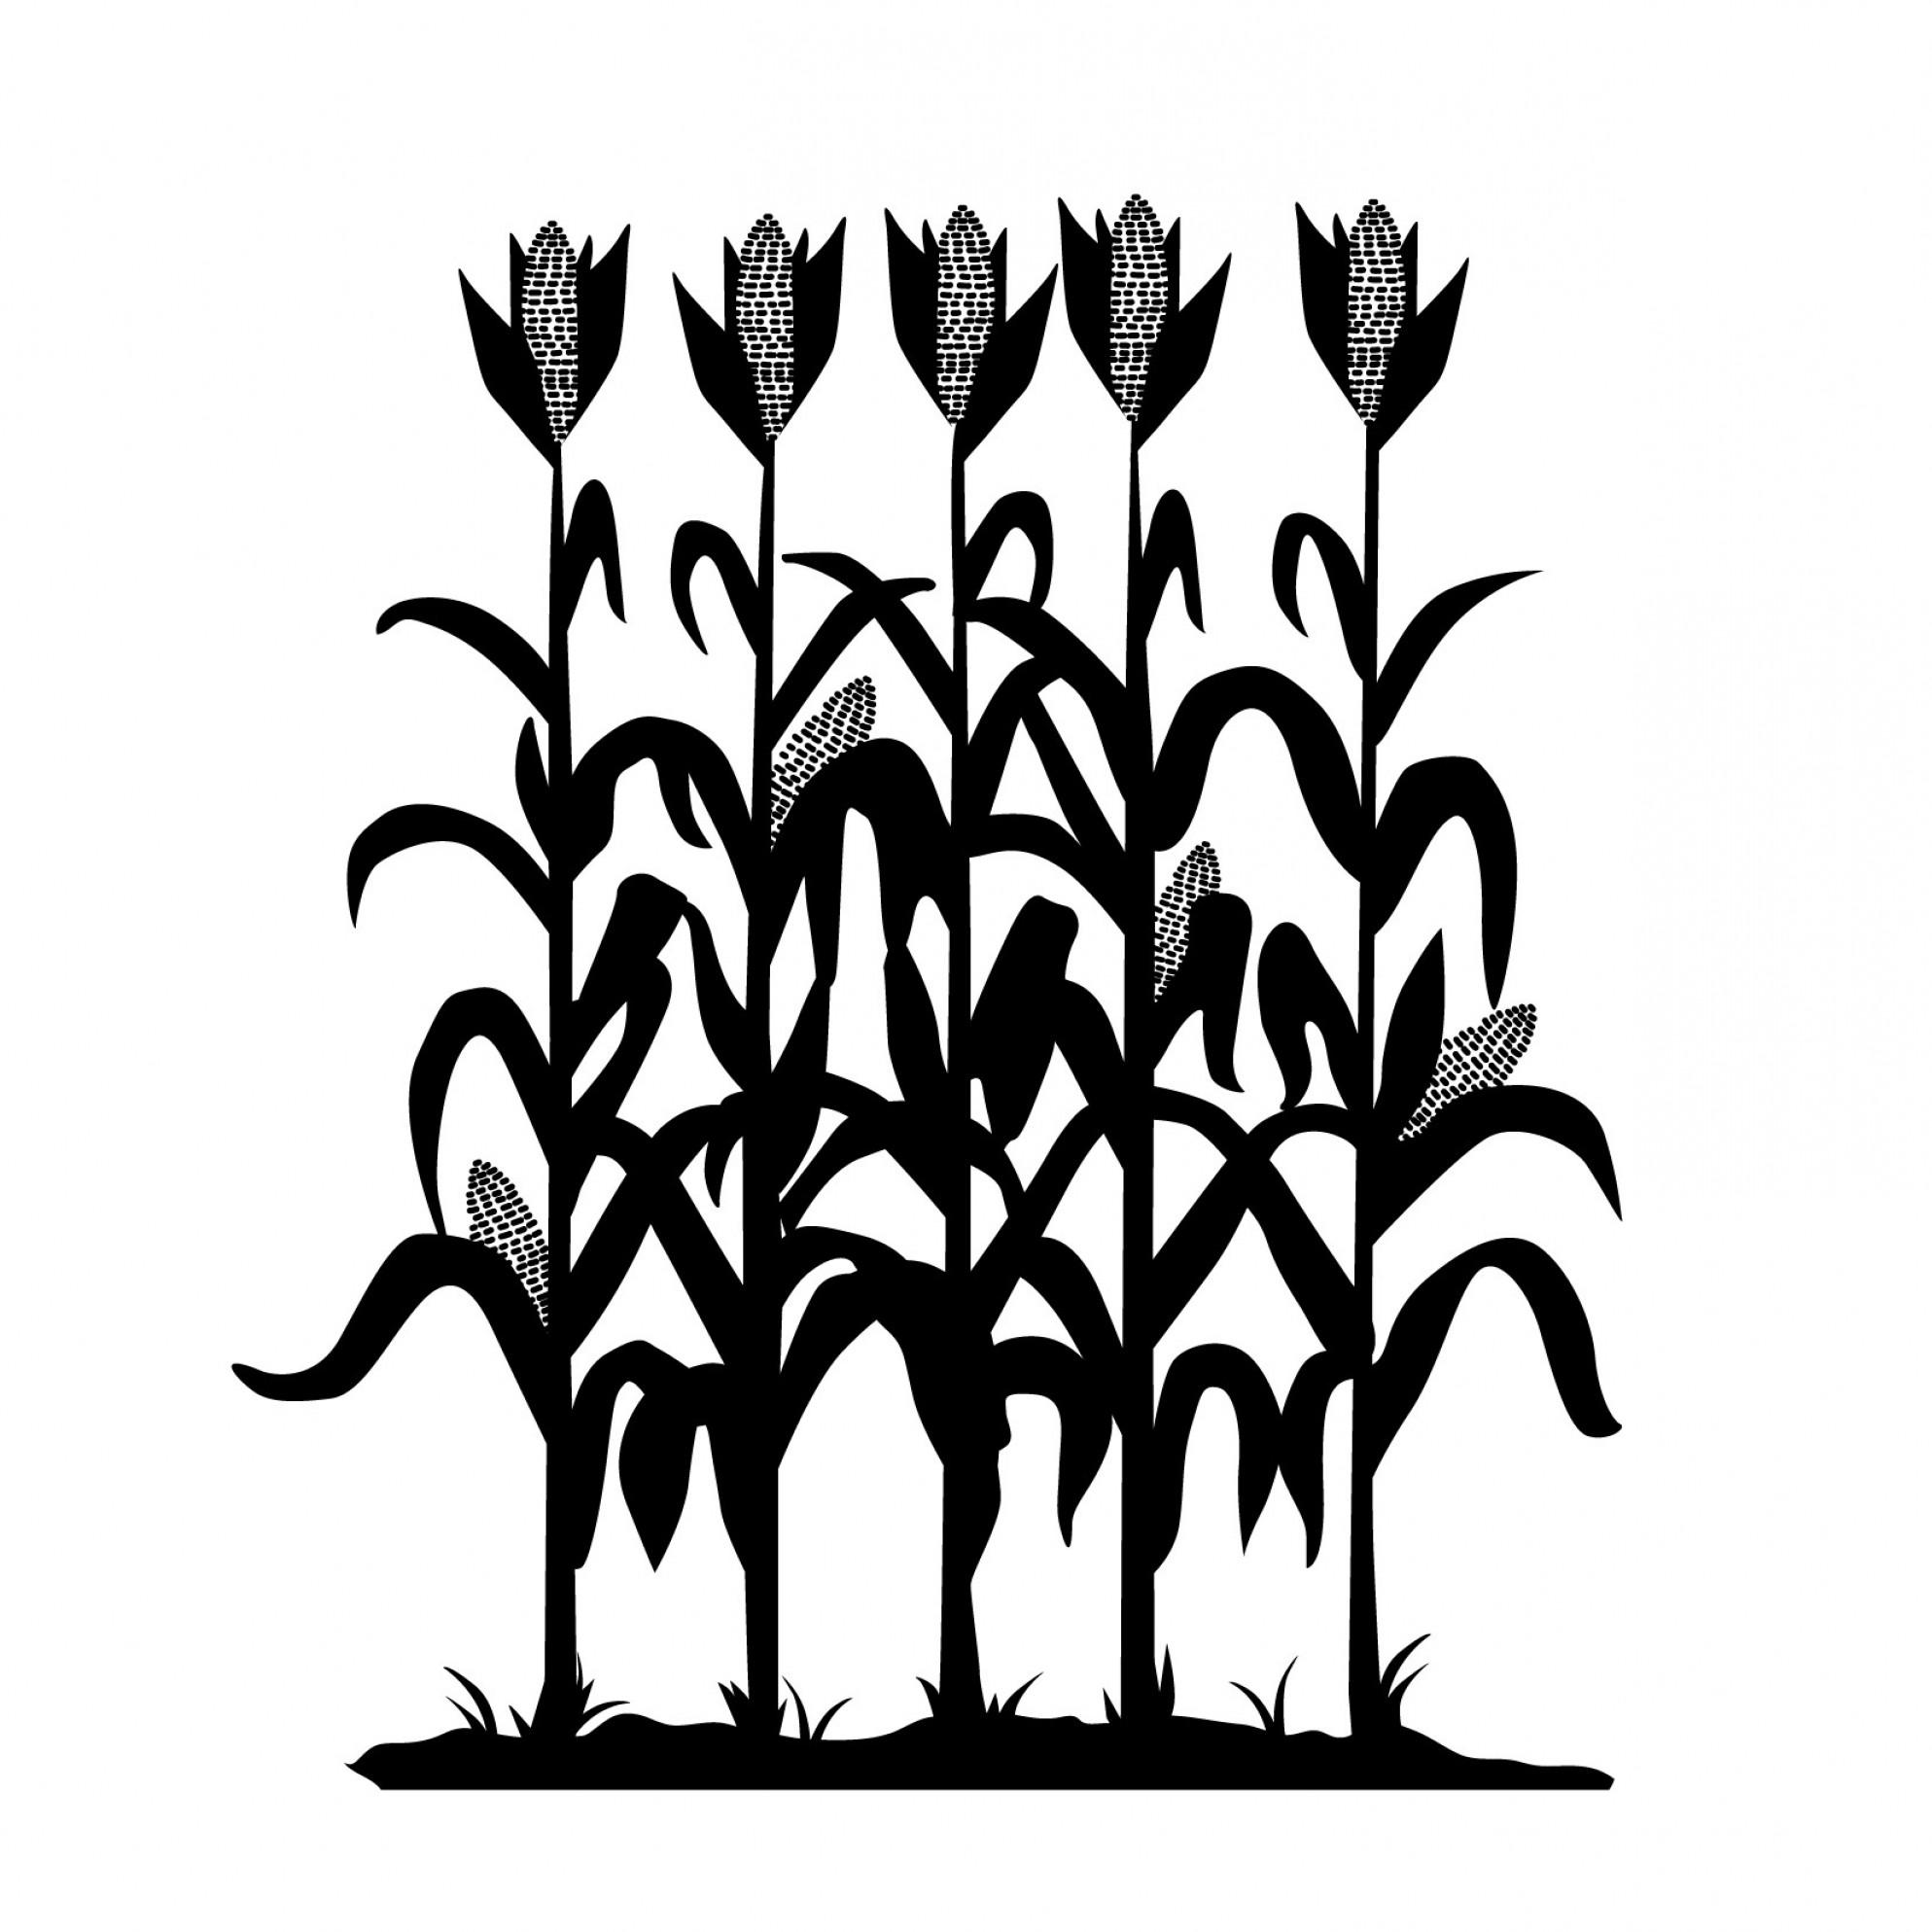 Cornfield Clipart | Free download best Cornfield Clipart ...